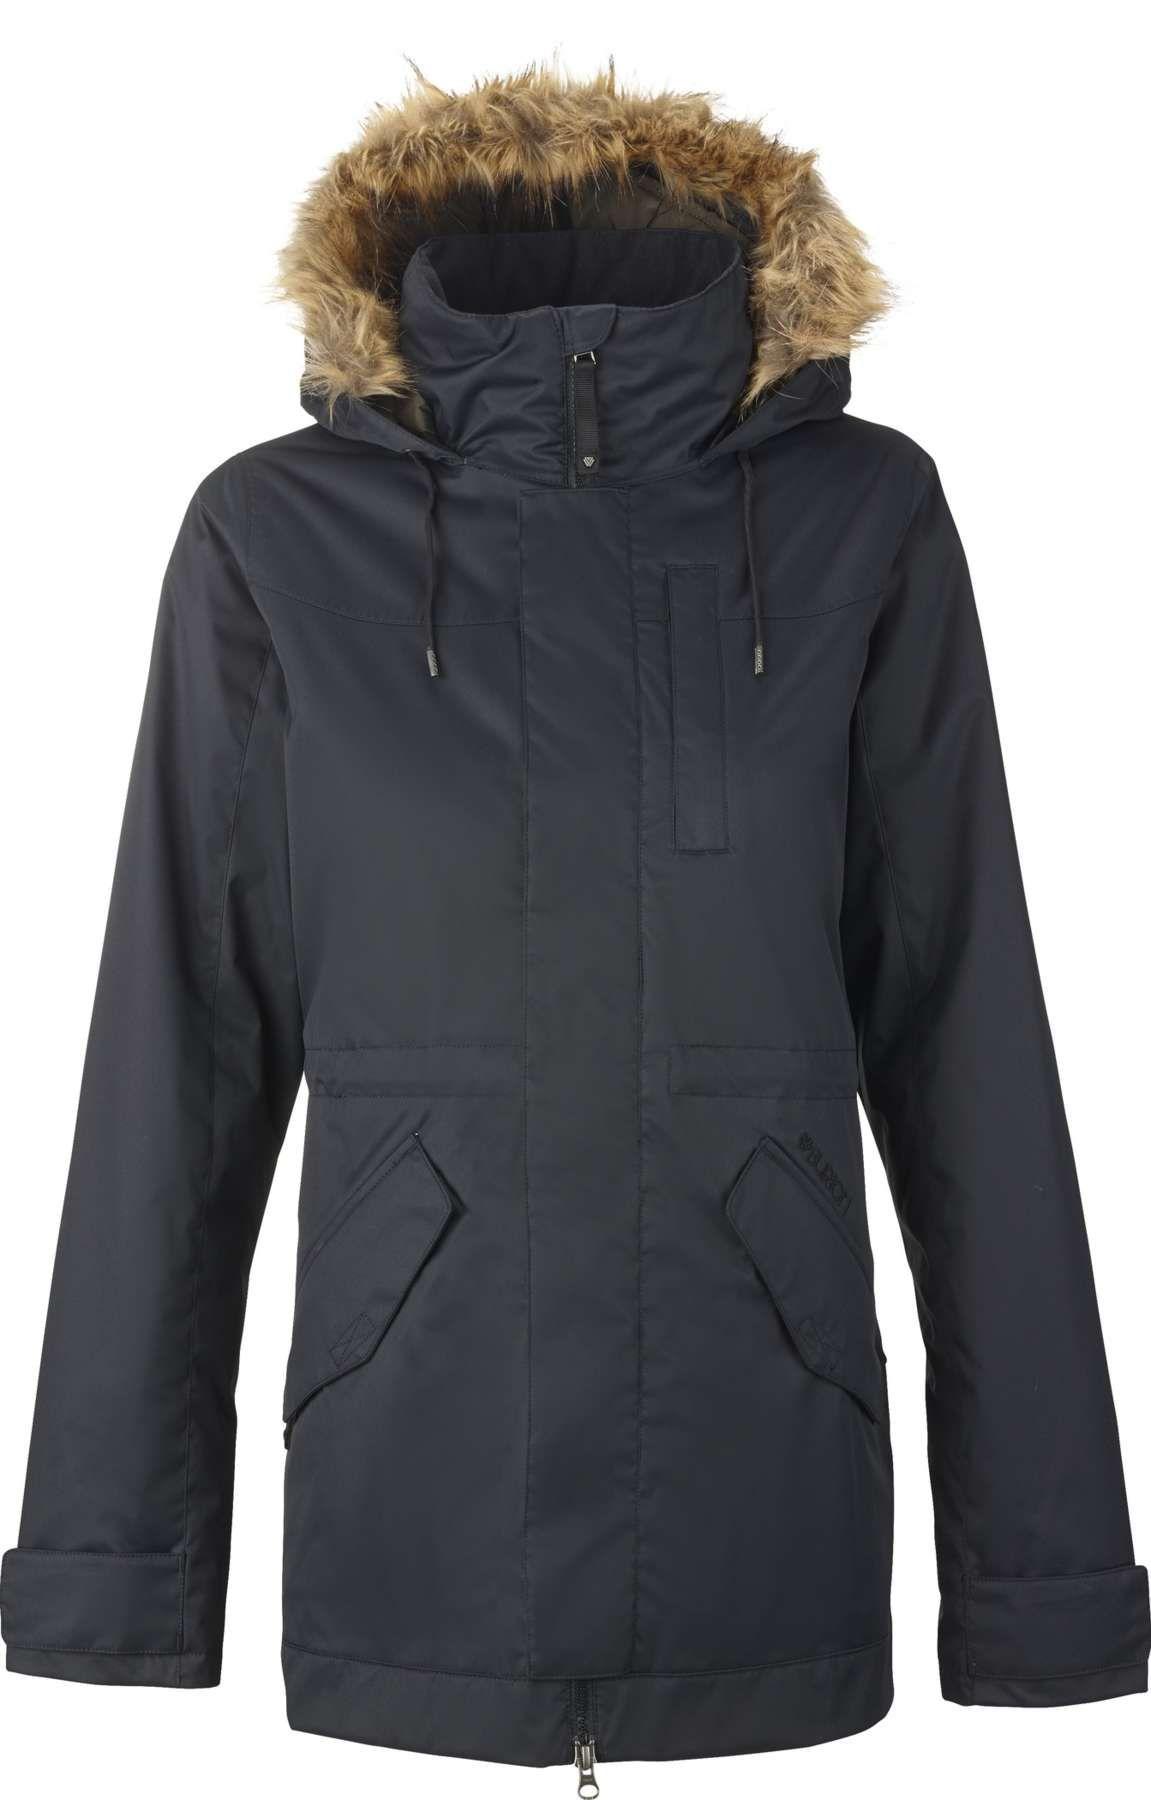 a239bcf2eef8 Burton TWC Wanderlust Women s Jacket